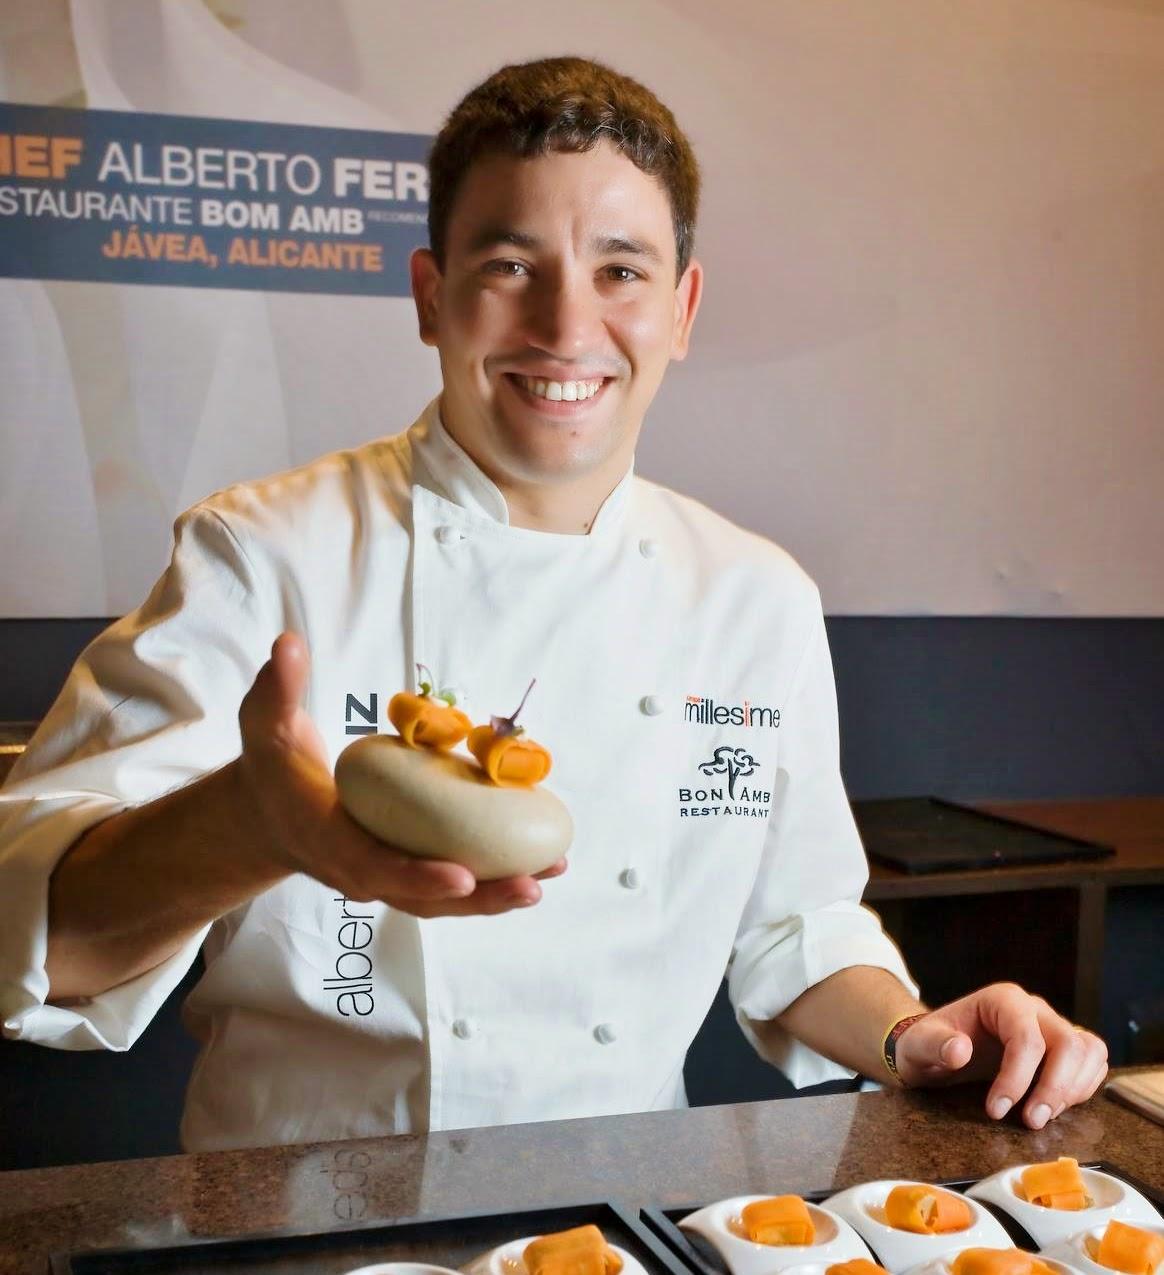 Alberto Ferruz The spanish food